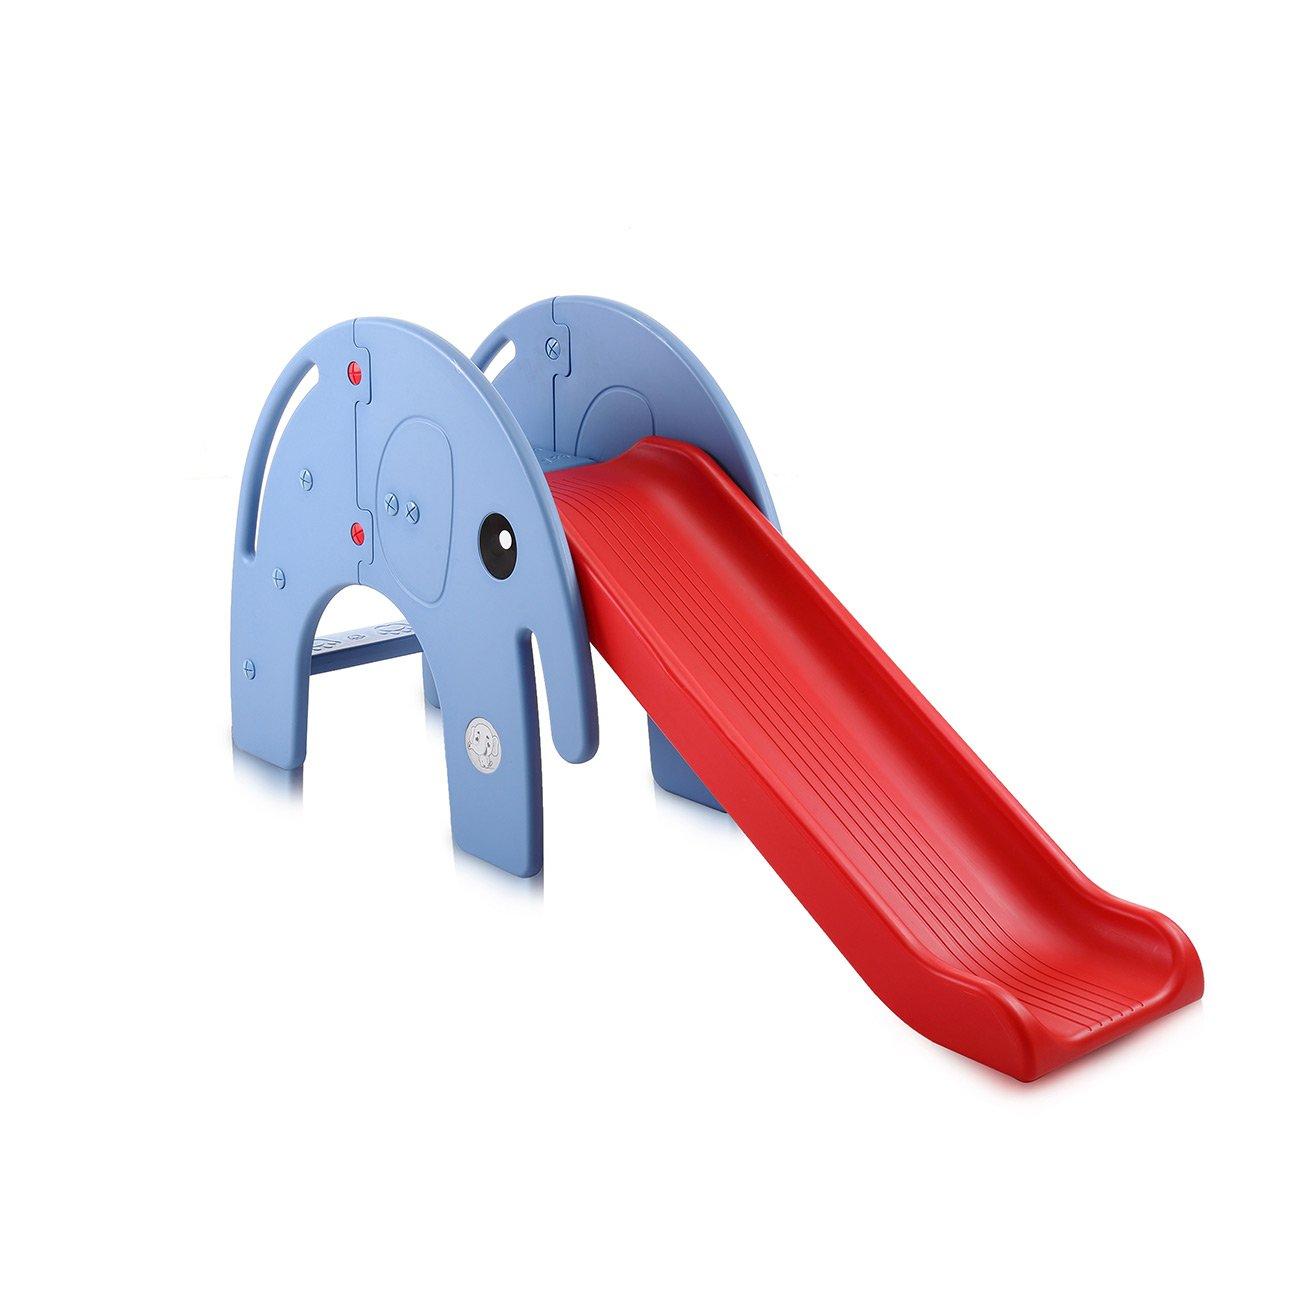 Elefantenrutsche - Baby Vivo Rutsche Elefant